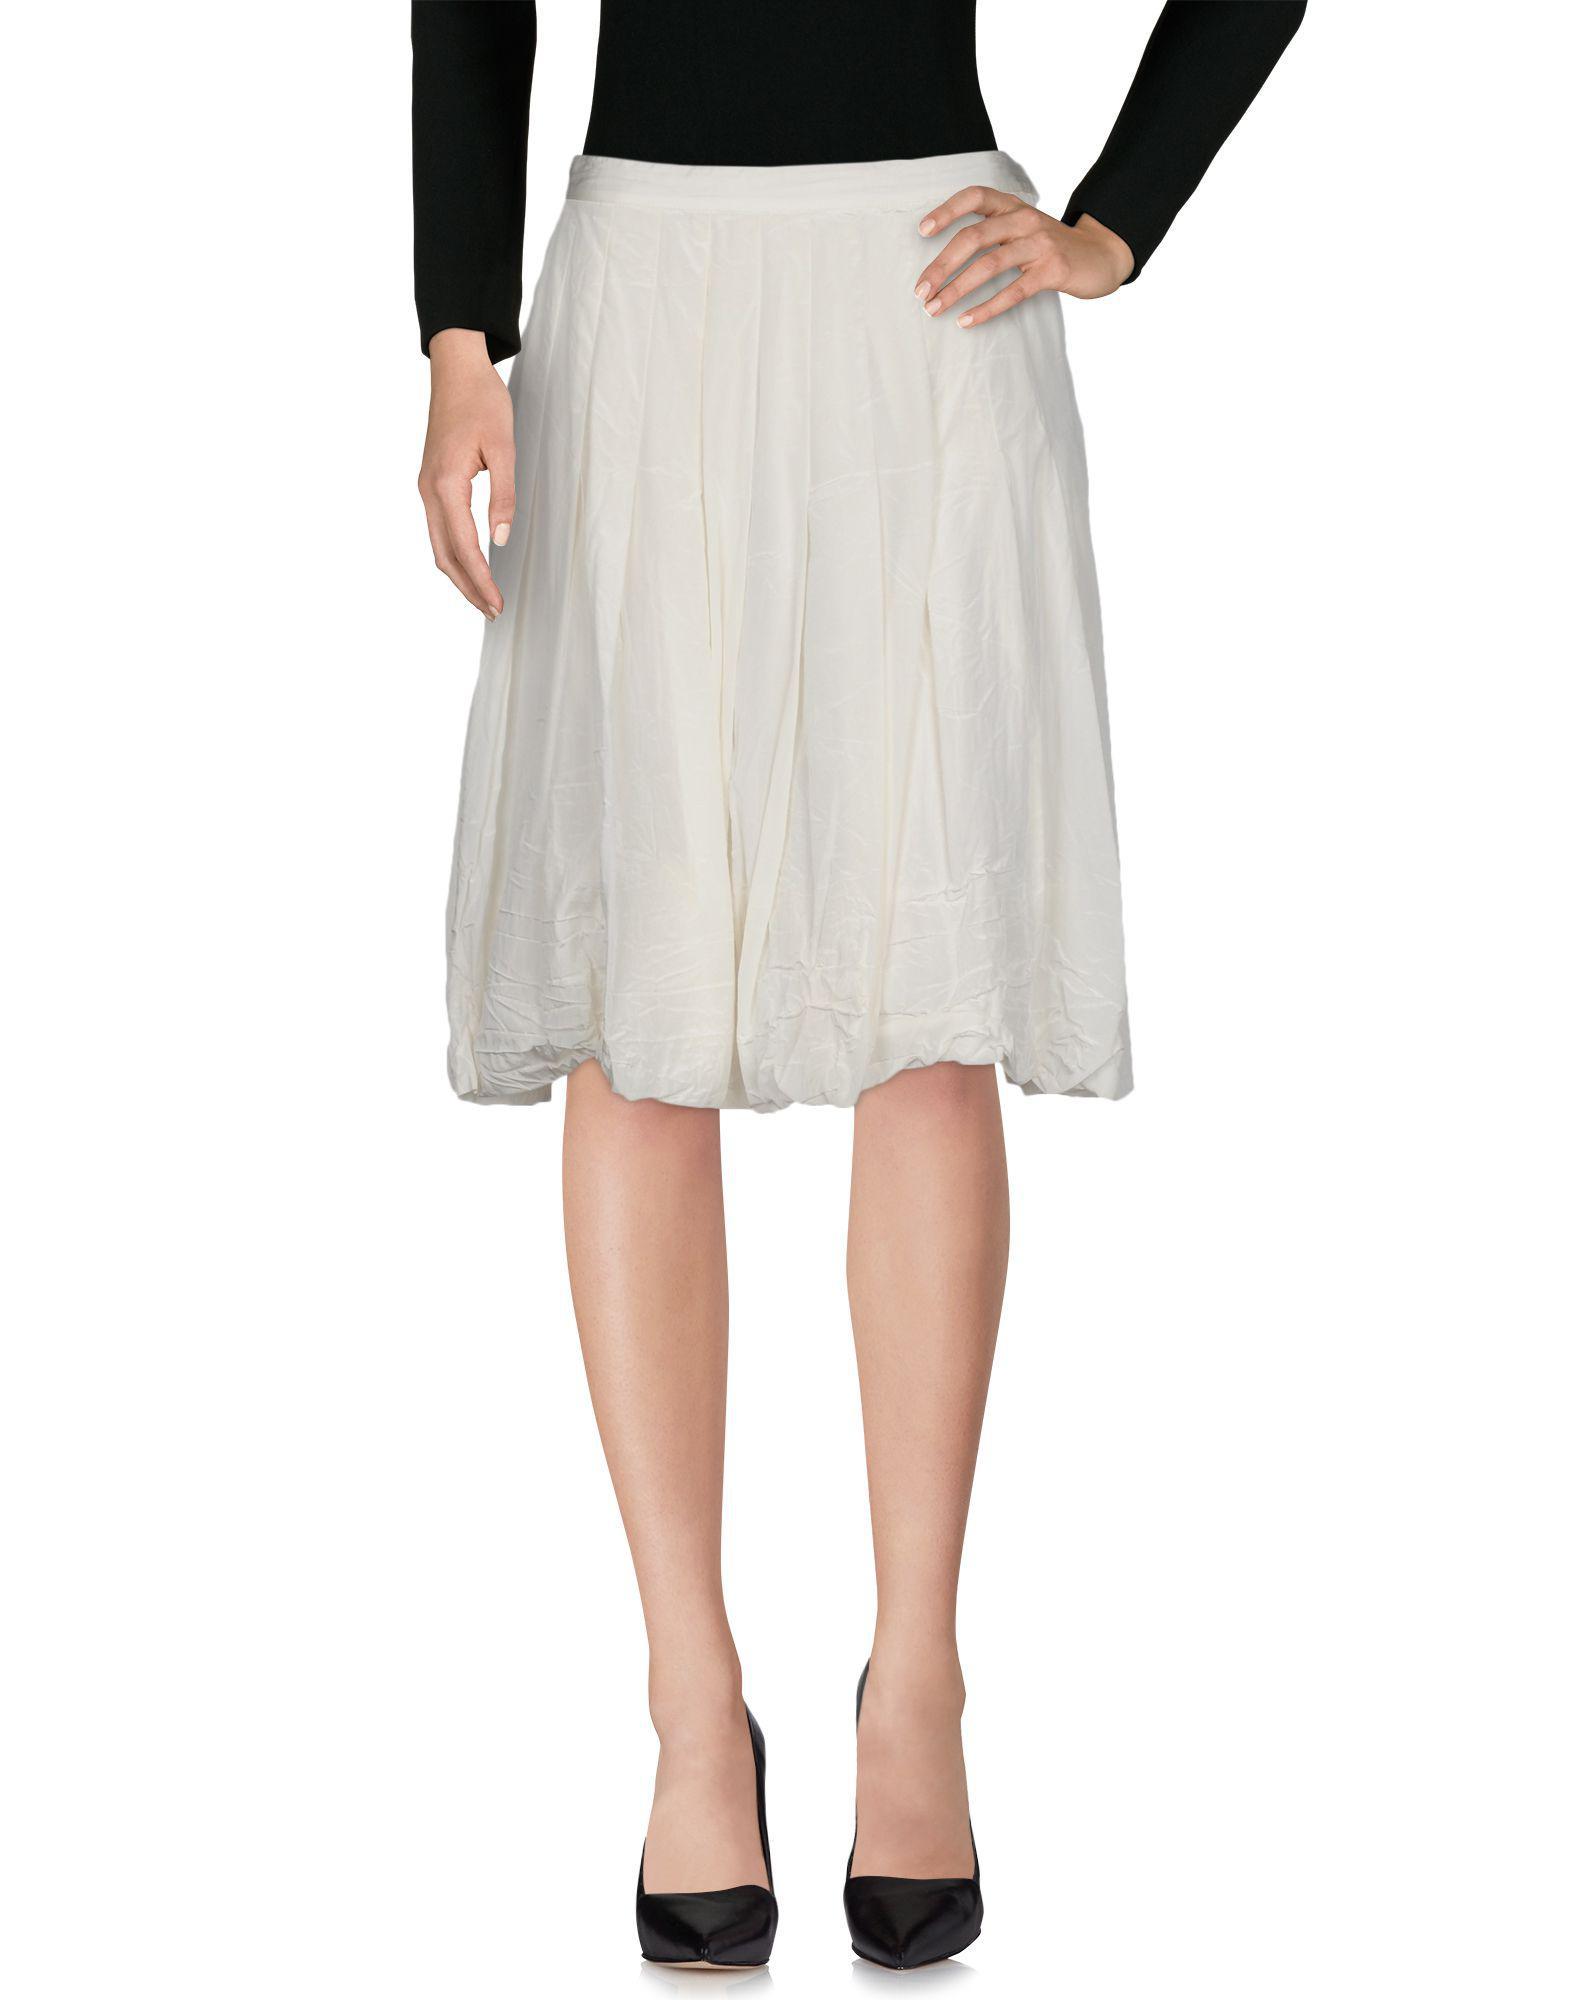 Blugirl pencil skirt Popular For Nice Clearance Footlocker Sale Collections TgbNp